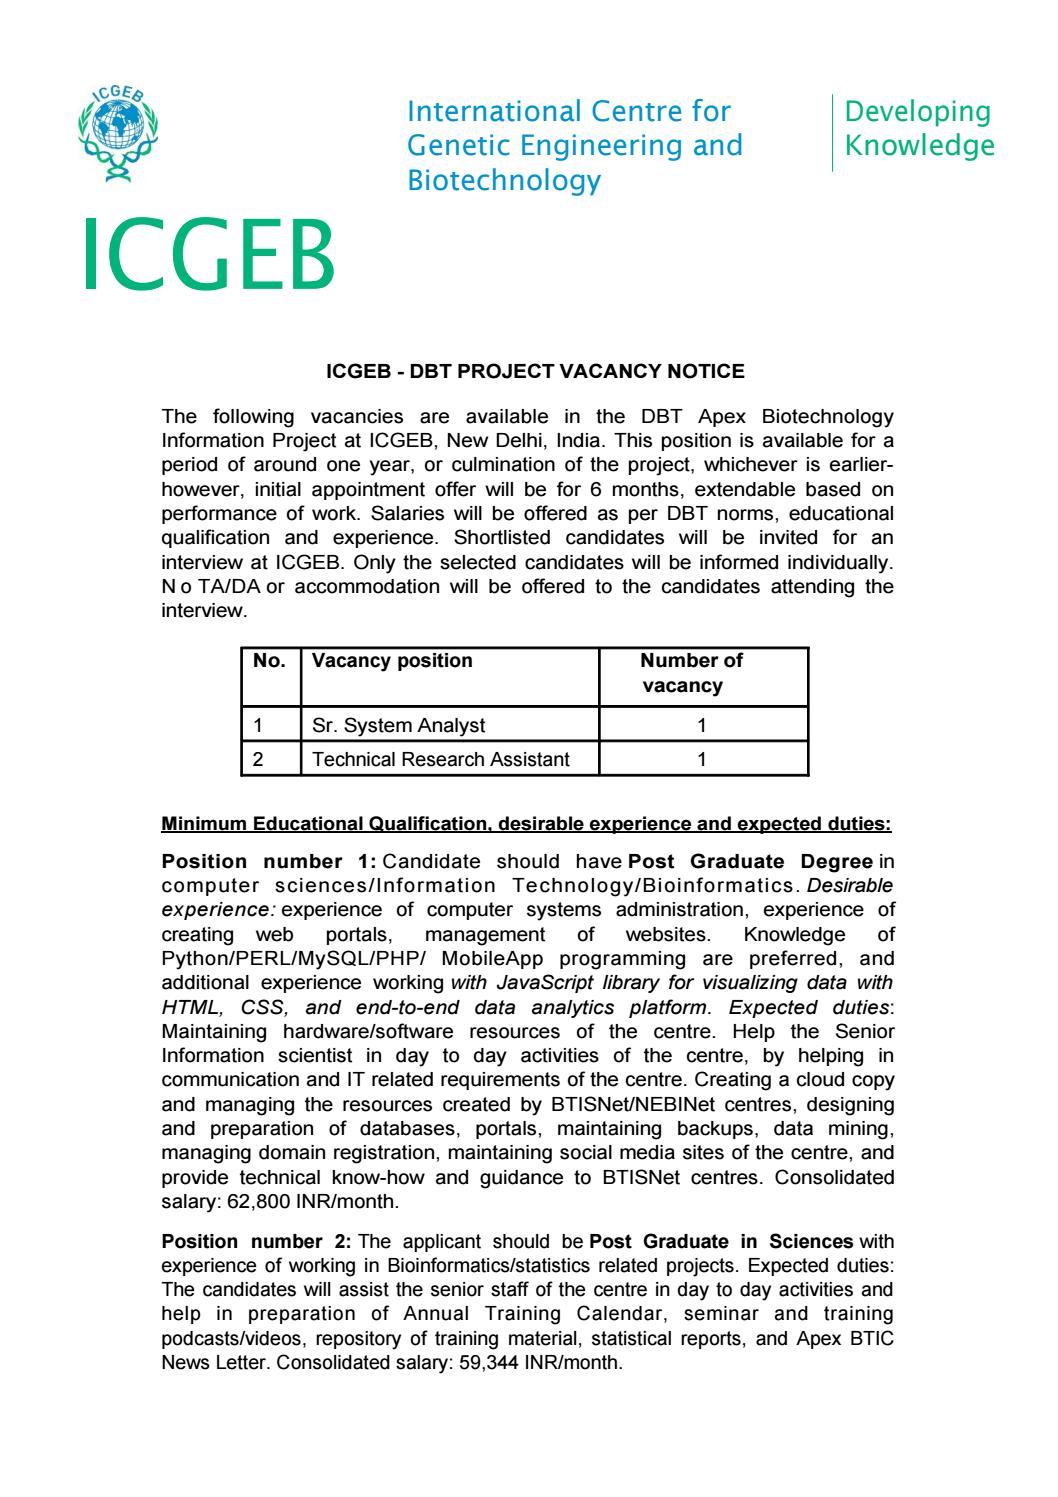 ICGEB MSc Bioinformatics Analyst Job With Rs  62,000 pm